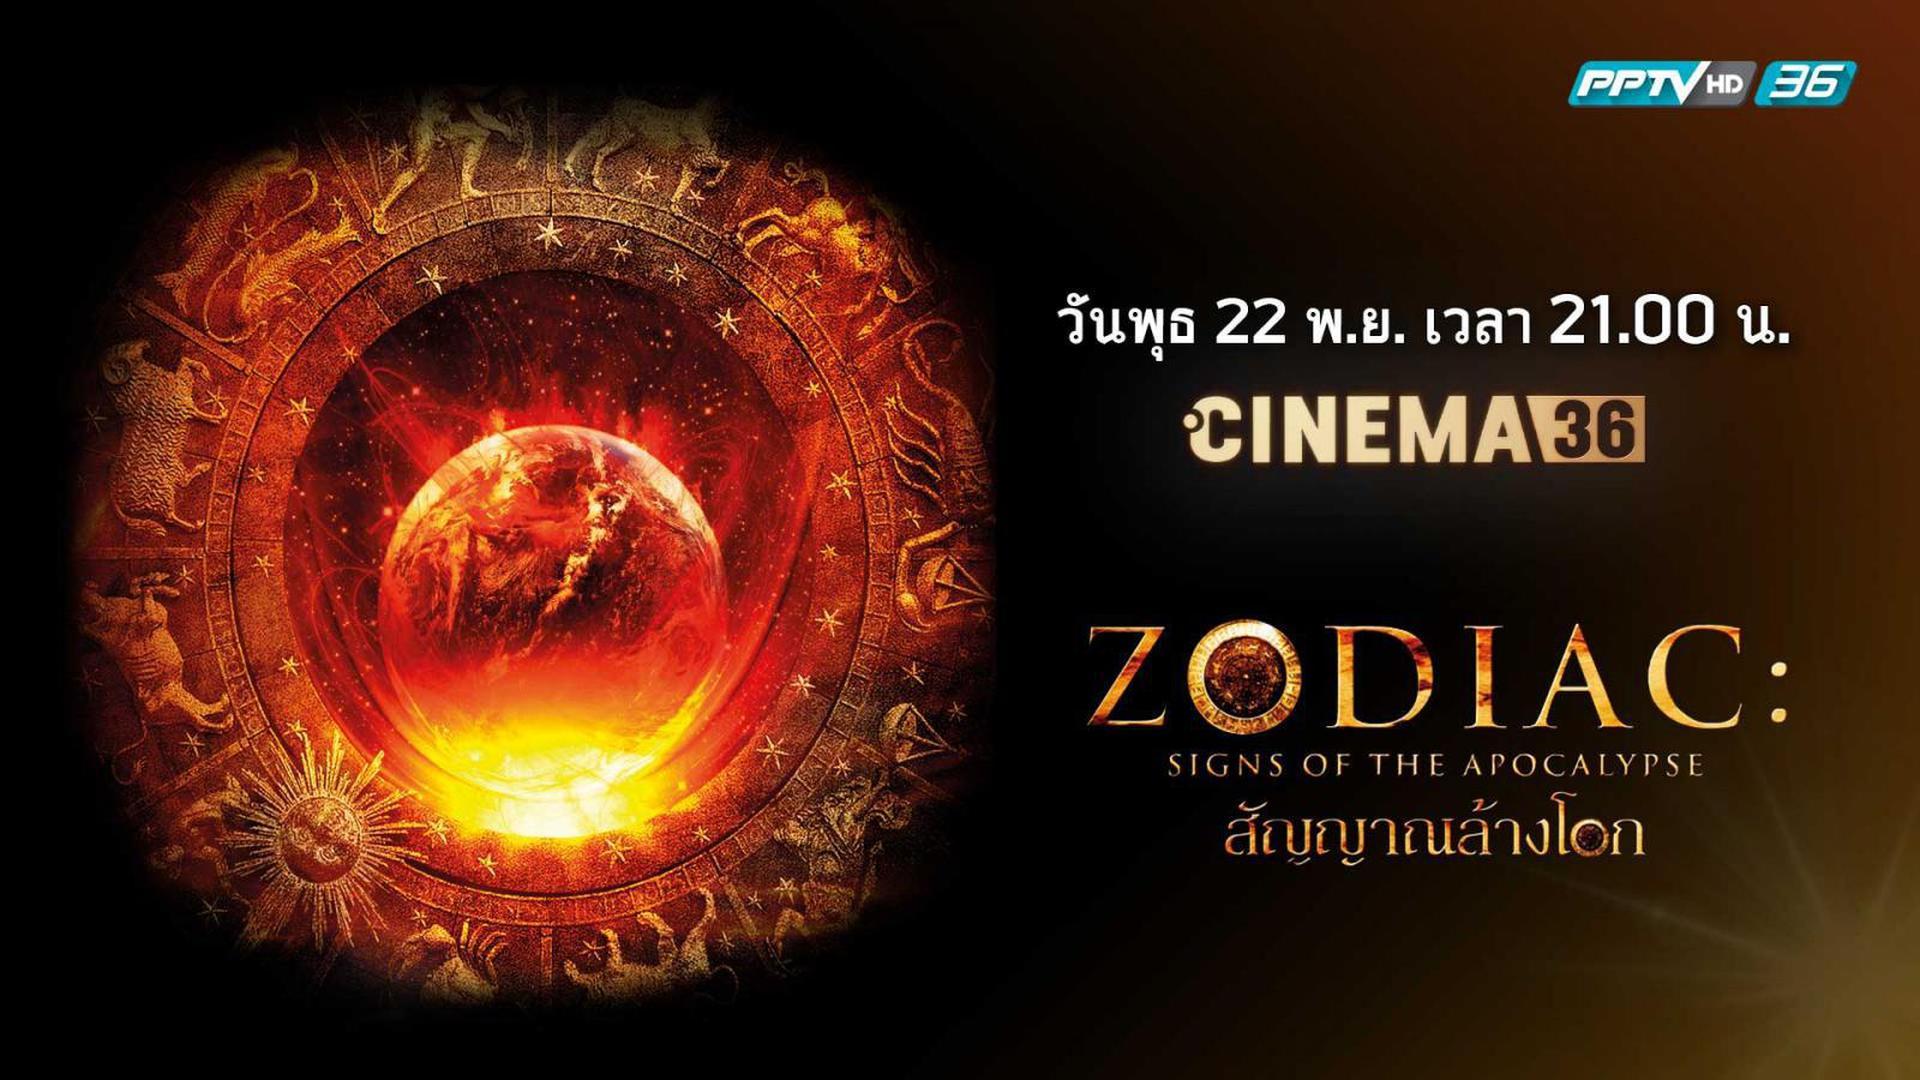 Zodiac : Signs Of The Apocalypse สัญญาณล้างโลก